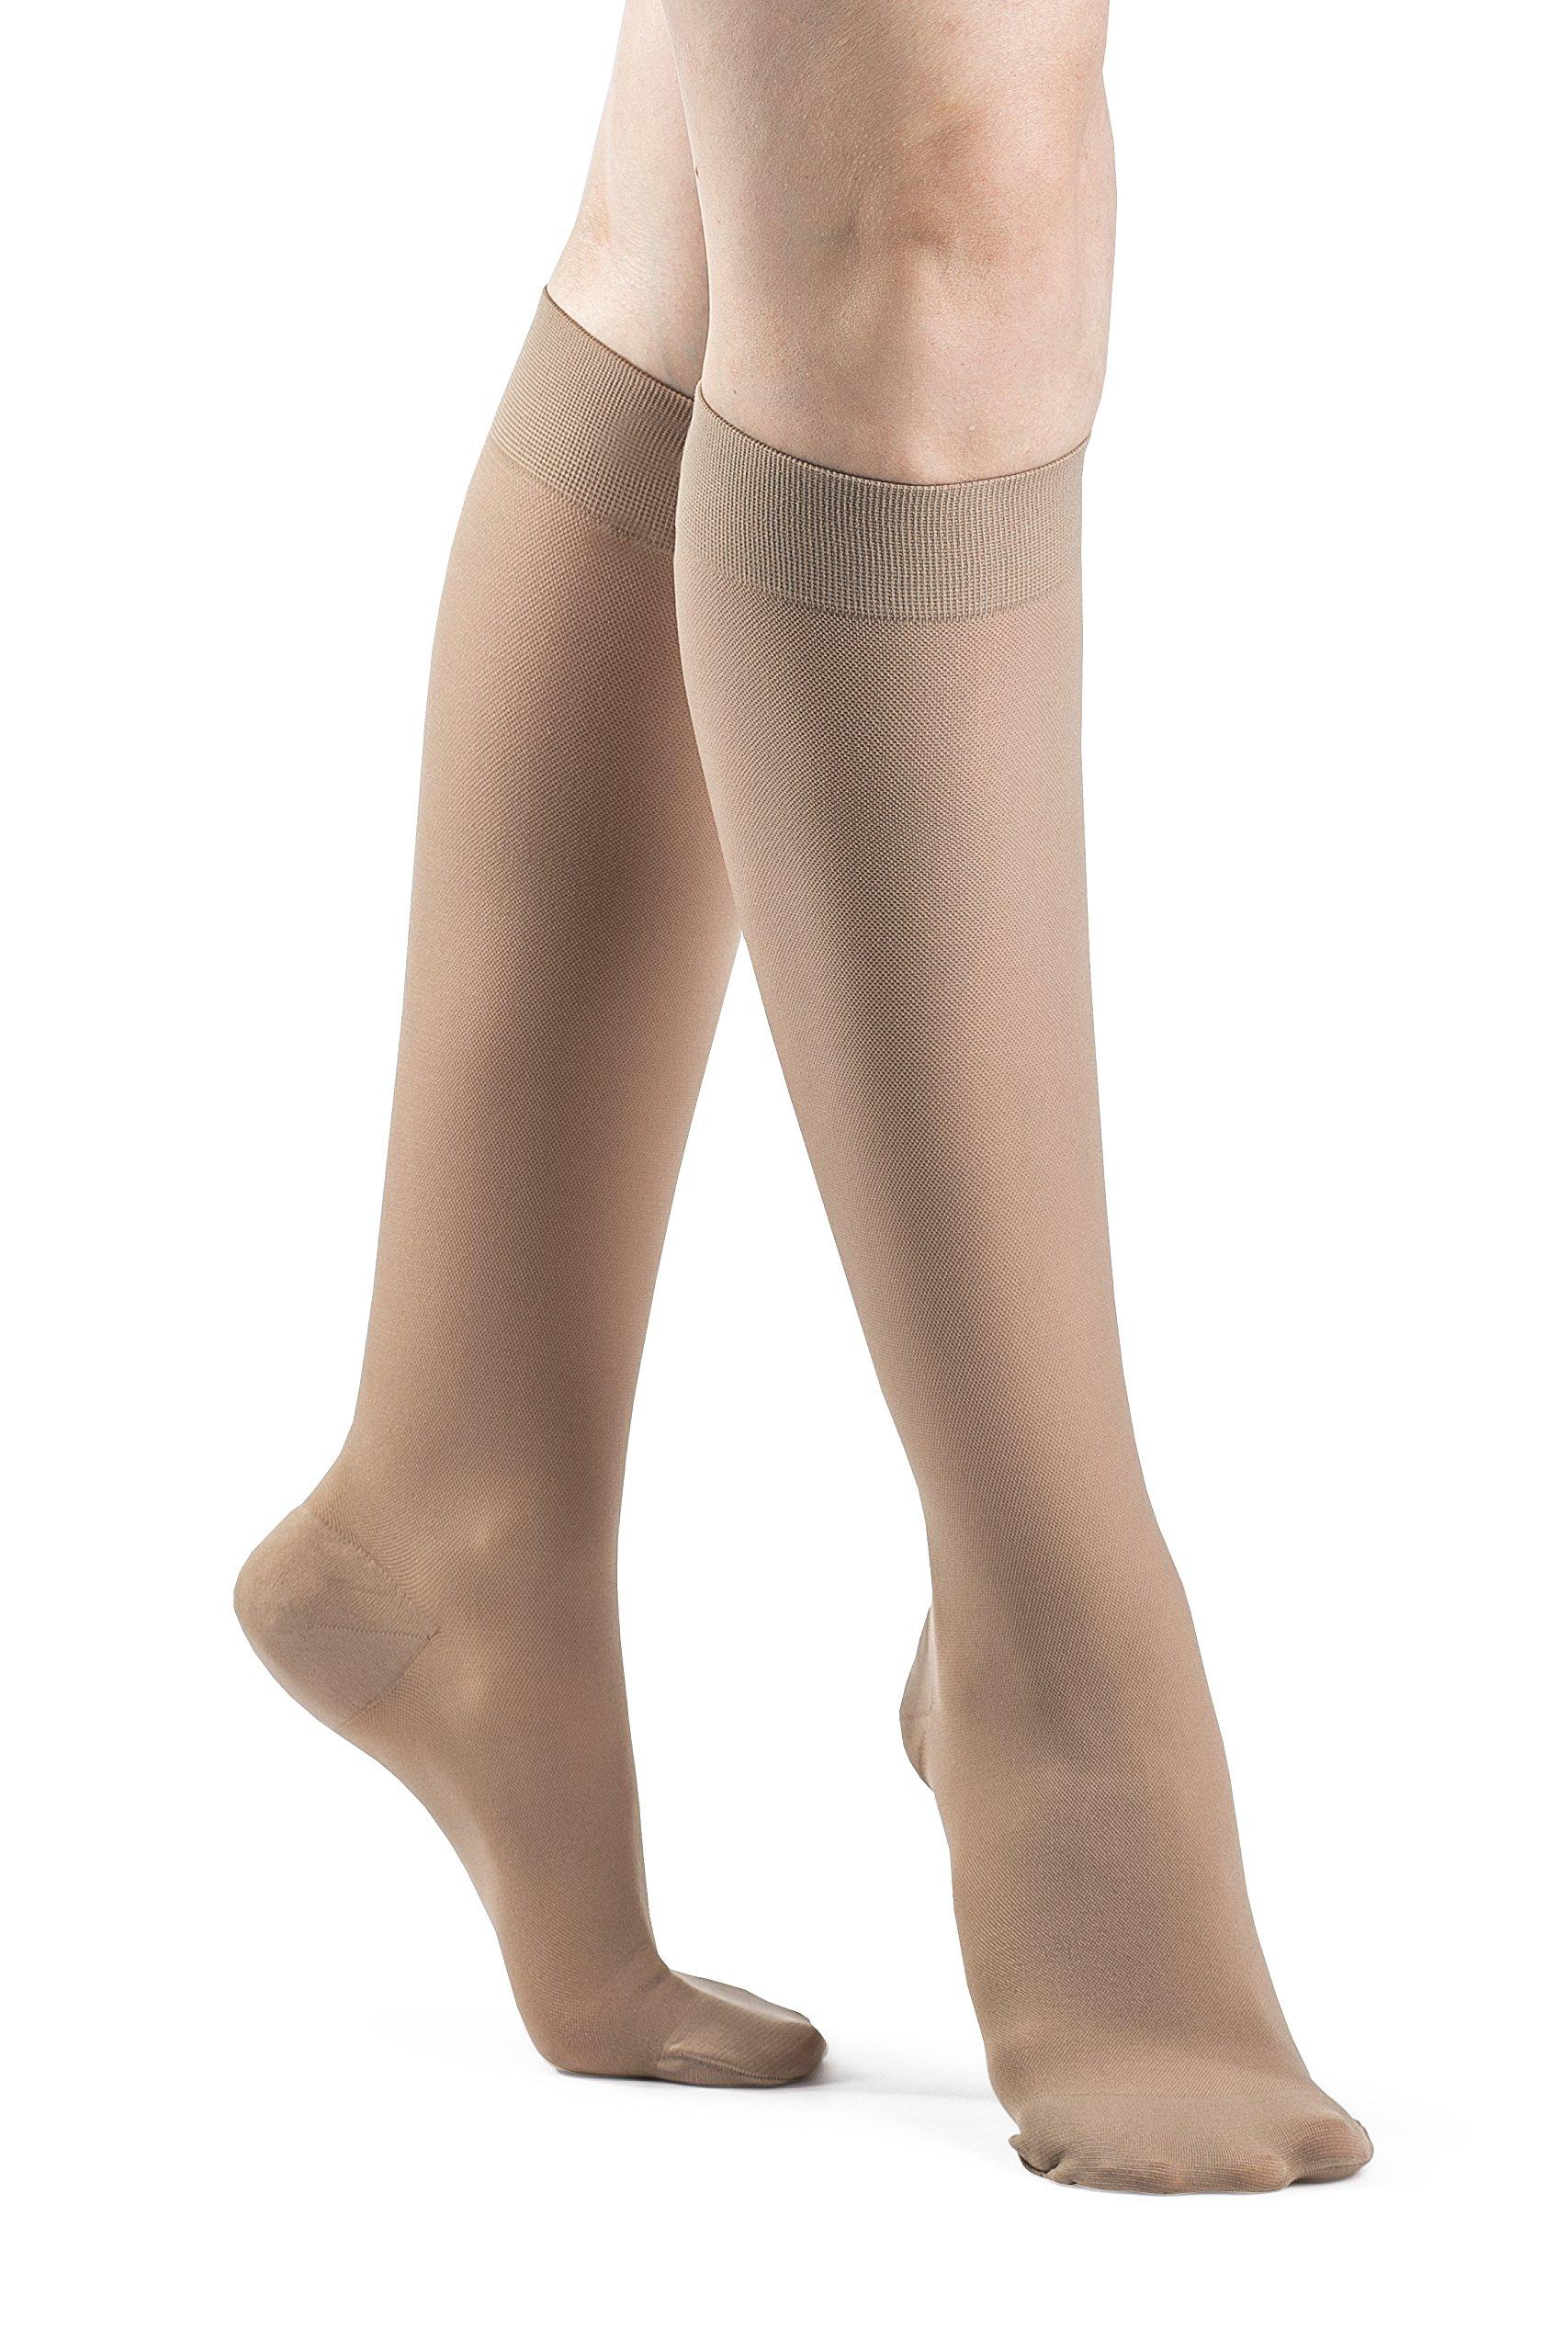 SIGVARIS Women's Access 970 Closed-Toe Calf High Medical Compression 15-20mmHg